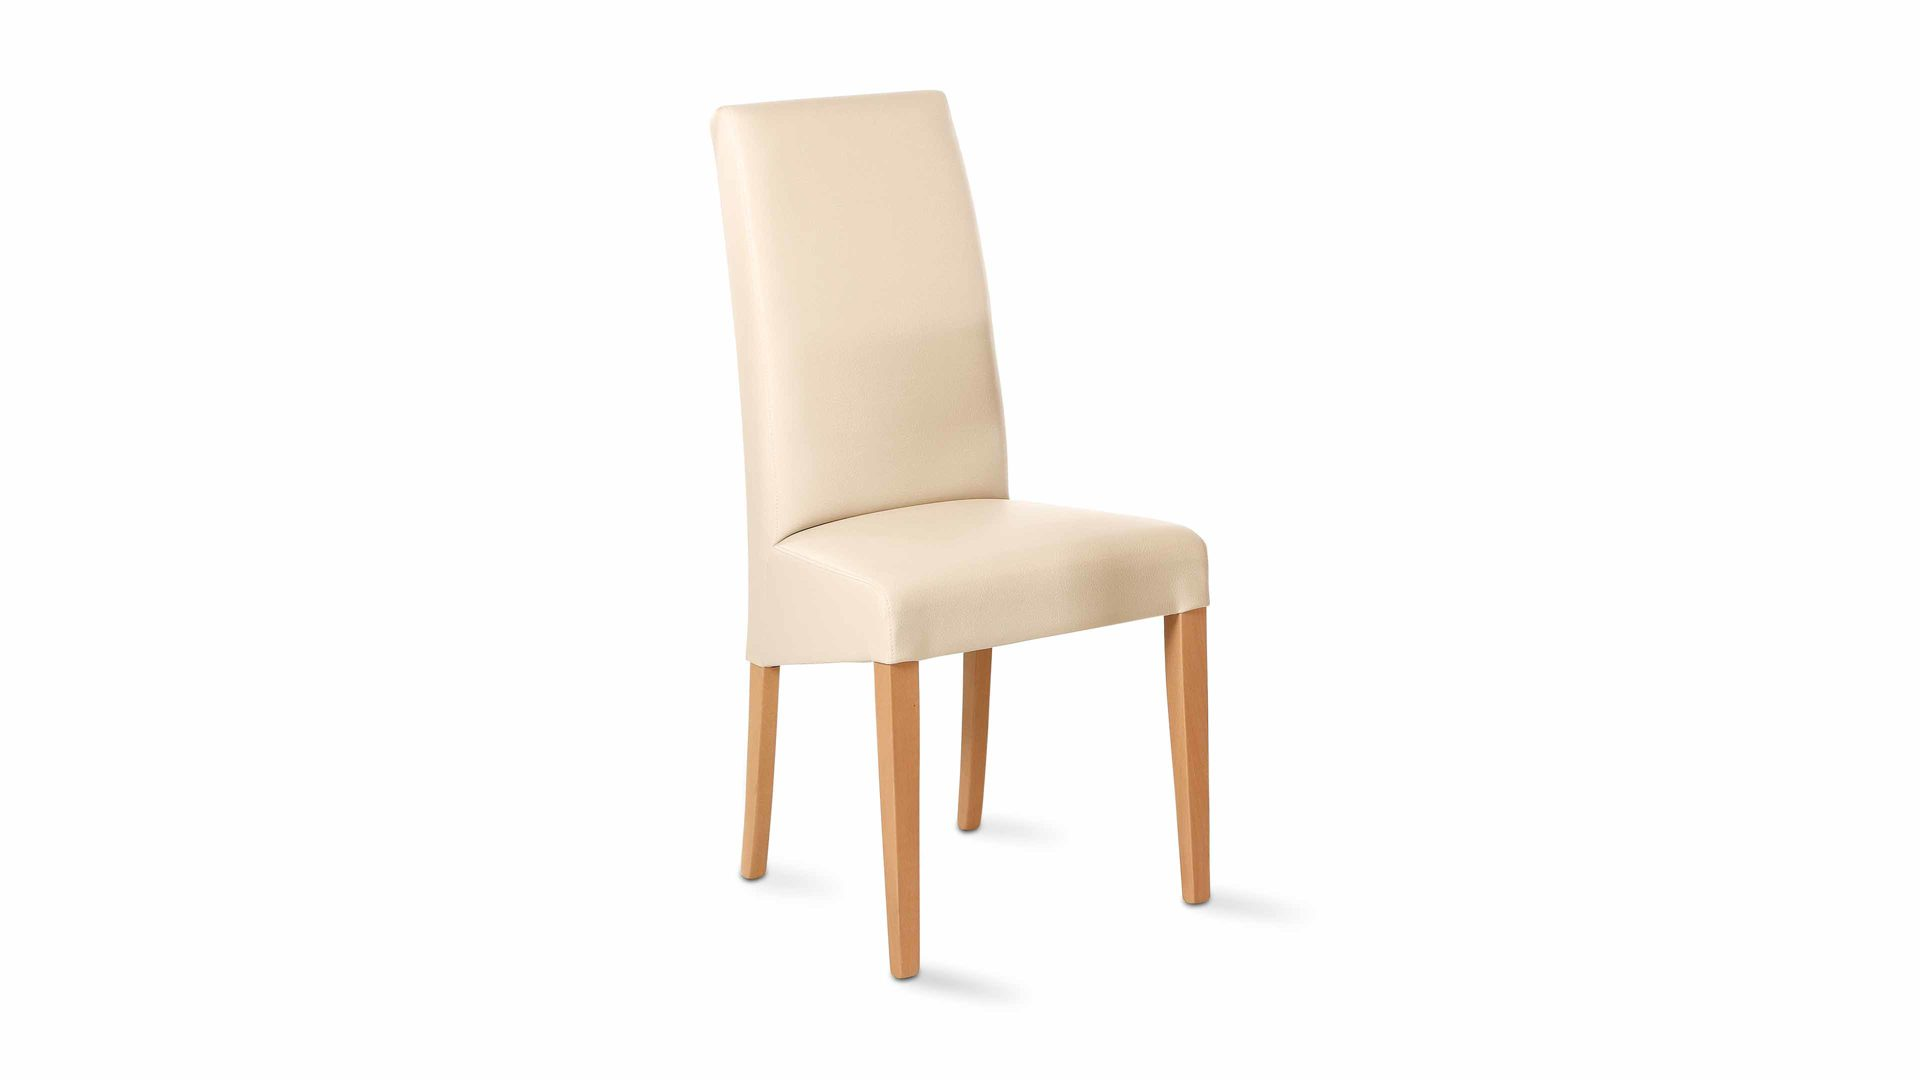 Hertel Mobel E K Gesees Polsterstuhl Ein Komfortables Sitzmobel